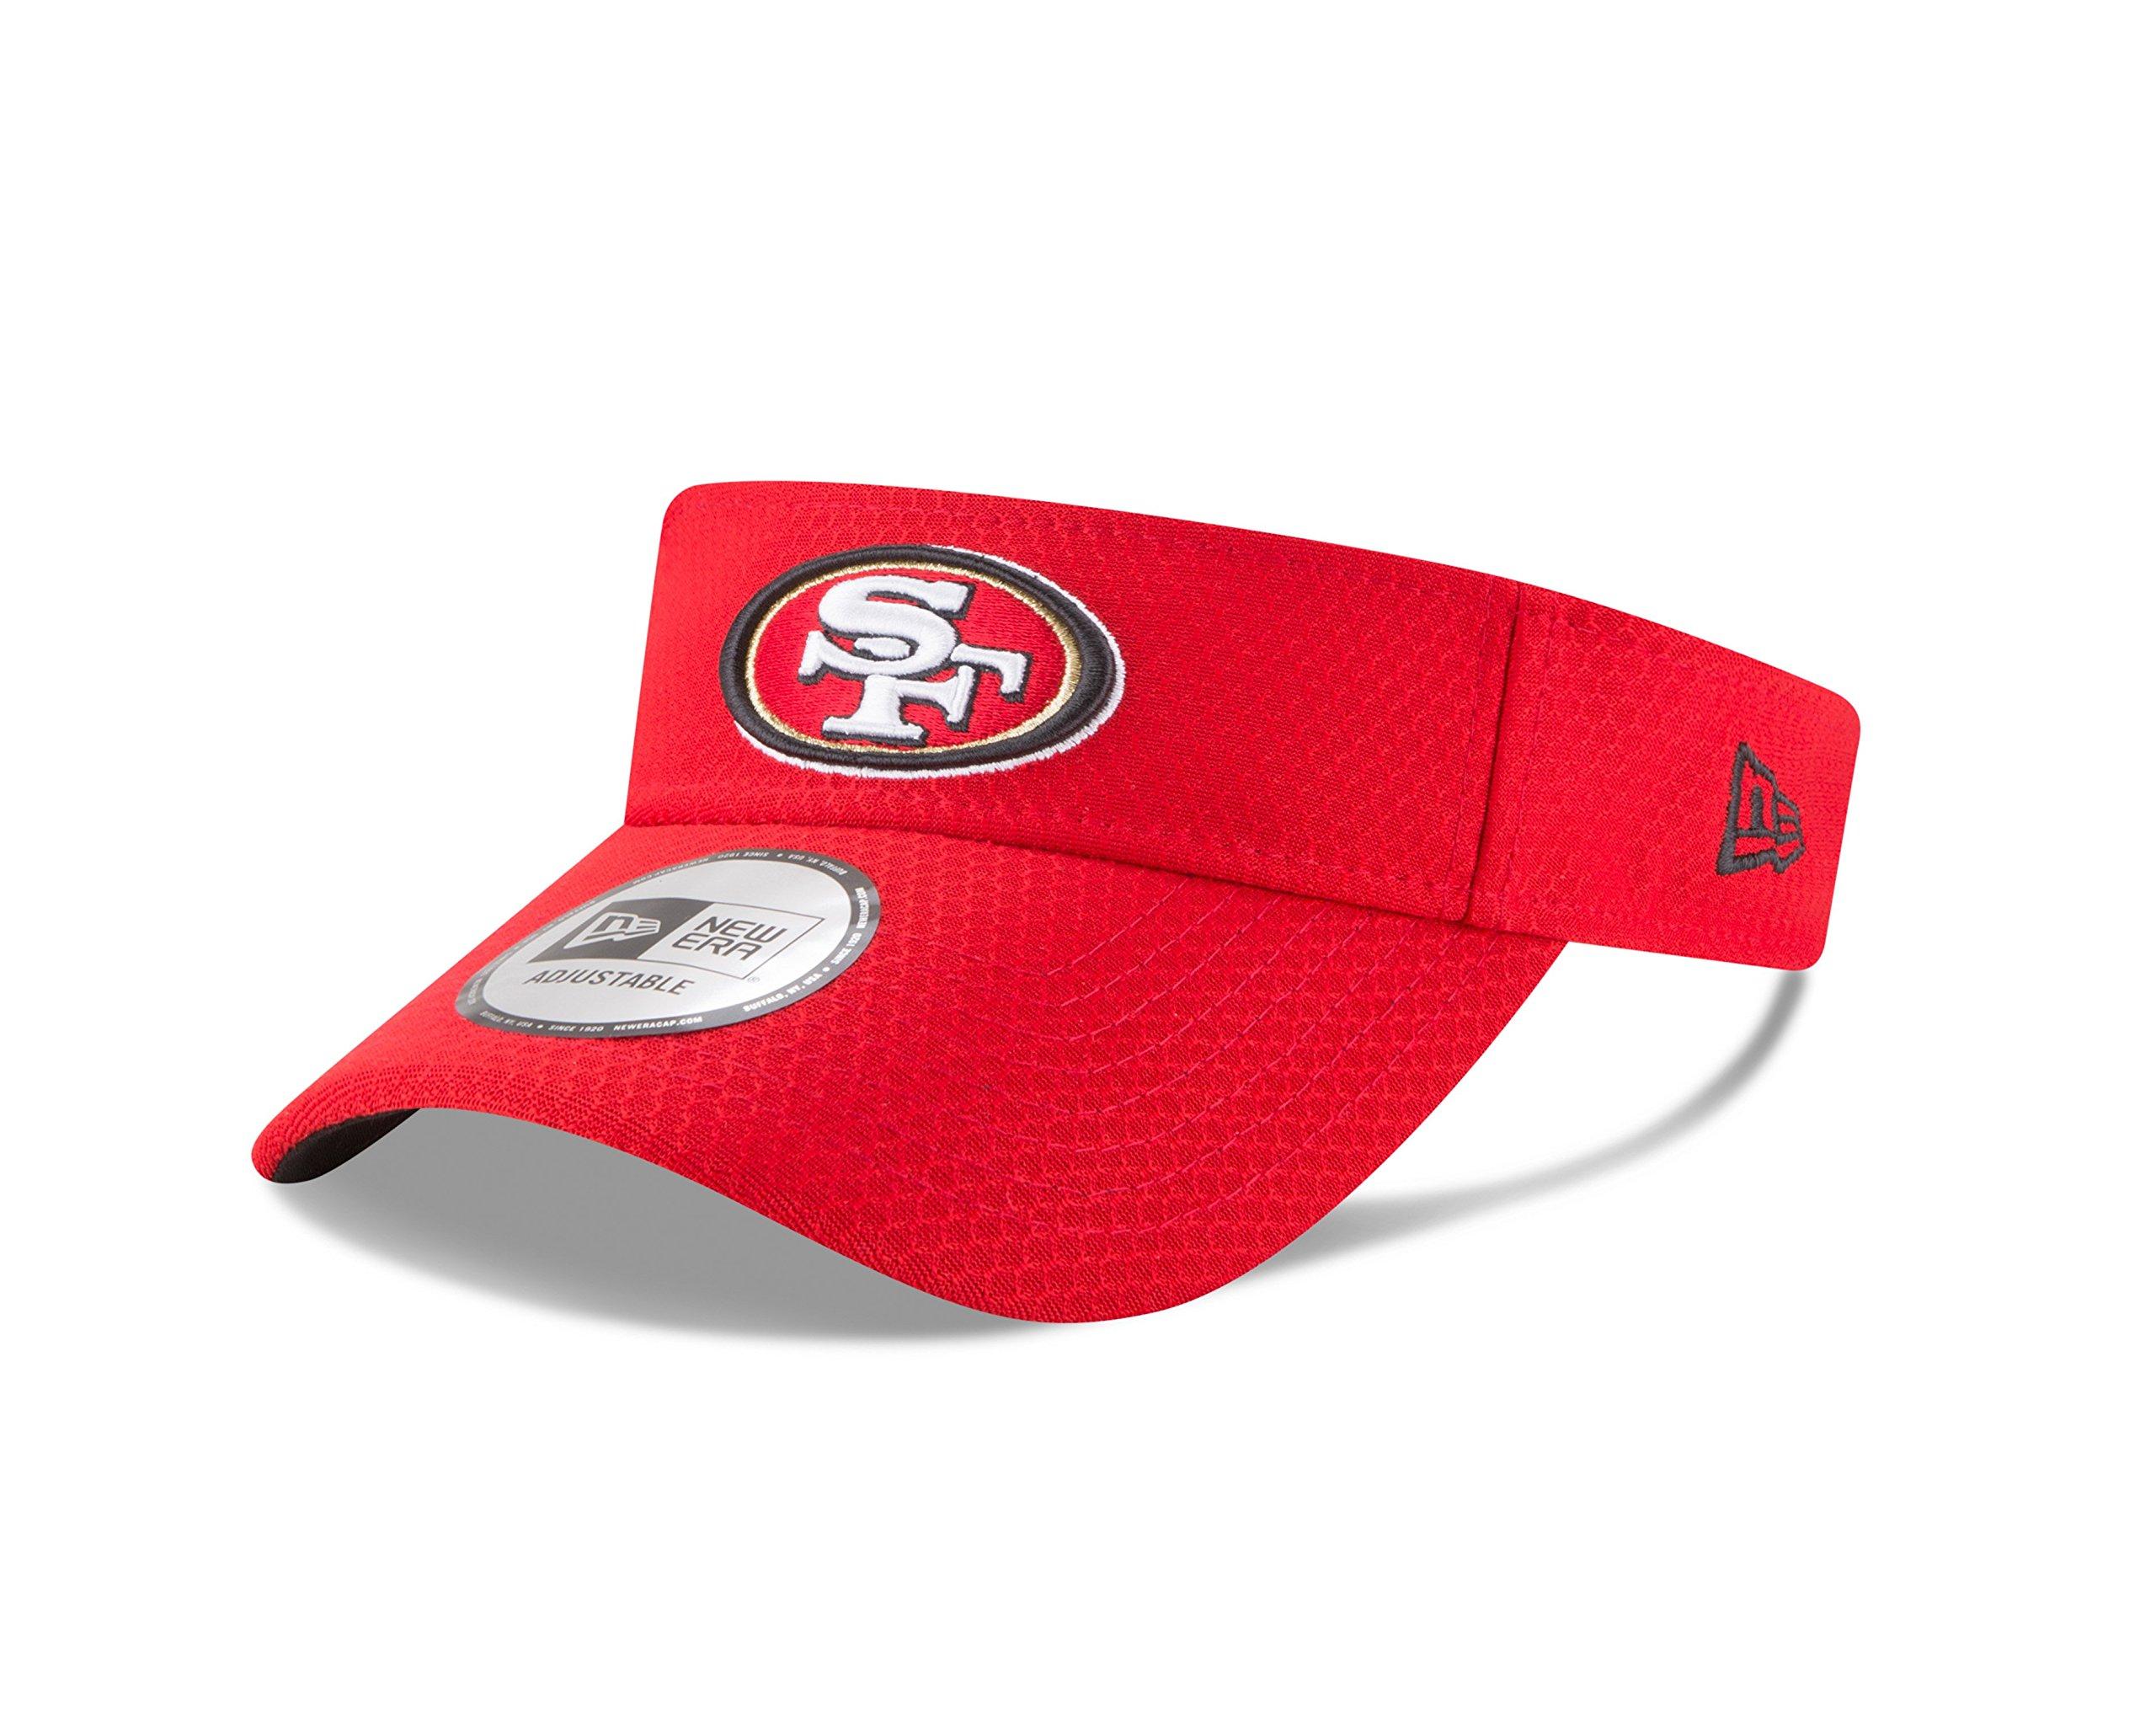 San Francisco 49ers New Era 2018 Training Camp Primary Visor - Scarlet by New Era